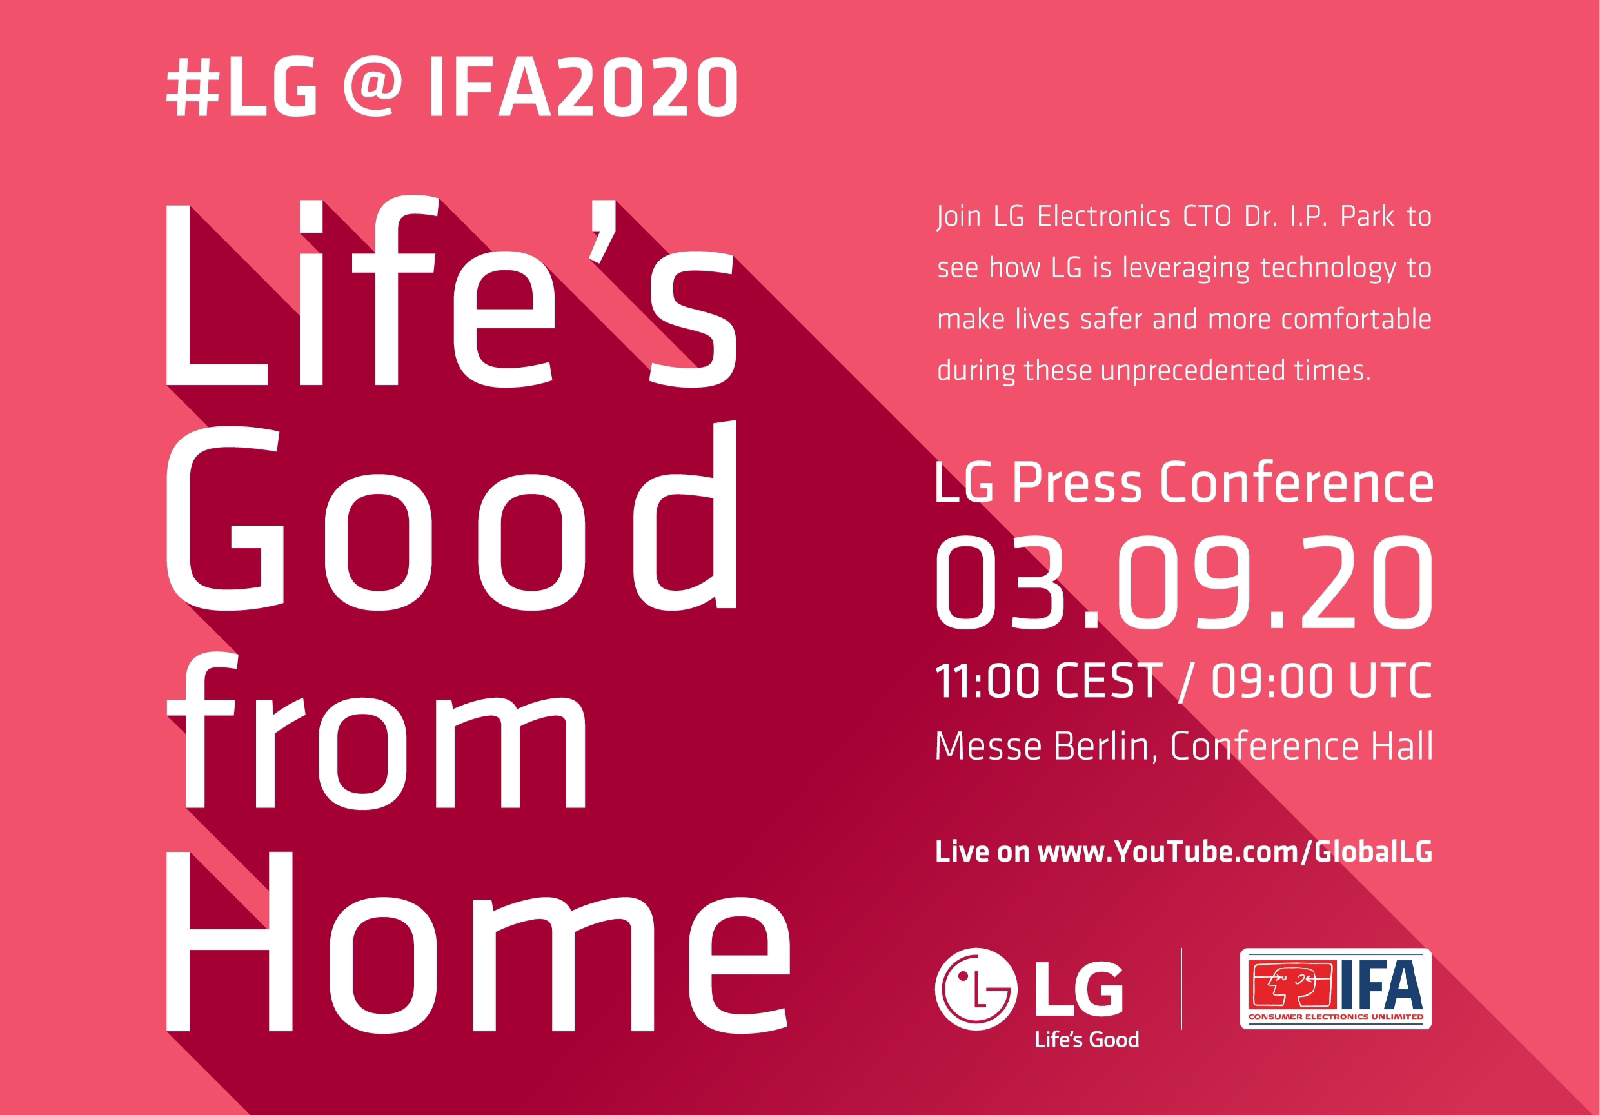 LG เชิญชวนคนไทยเข้าร่วมงาน IFA 2020 ผ่านออนไลน์ ร่วมกับชาติต่างๆ ทั่วโลก